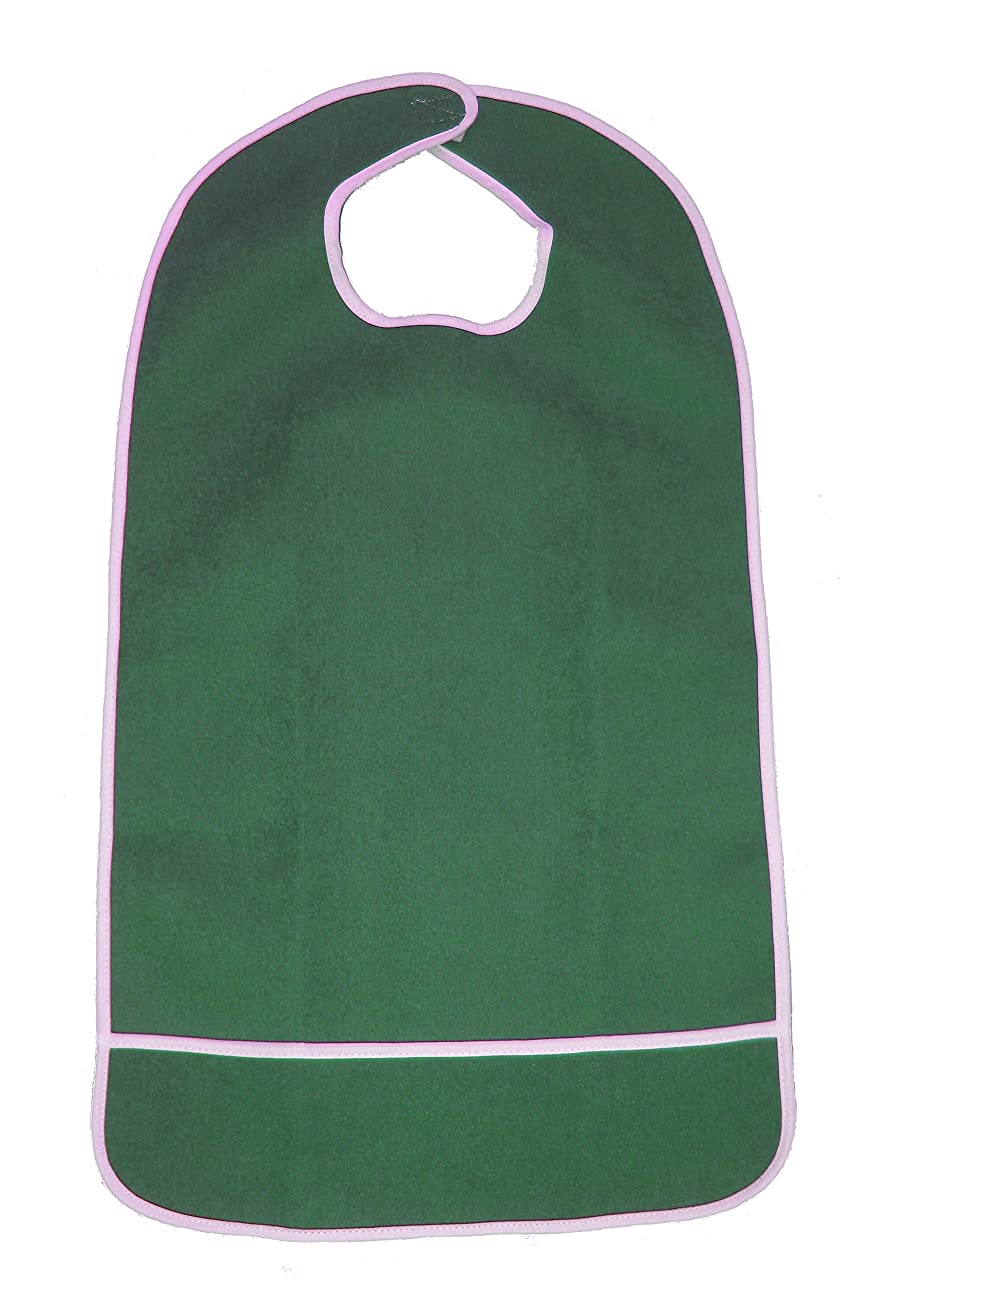 FlexaMed Waterproof Terry Cloth Adult Bib w/Closure and Crumb Catcher (Hunter Green - 16